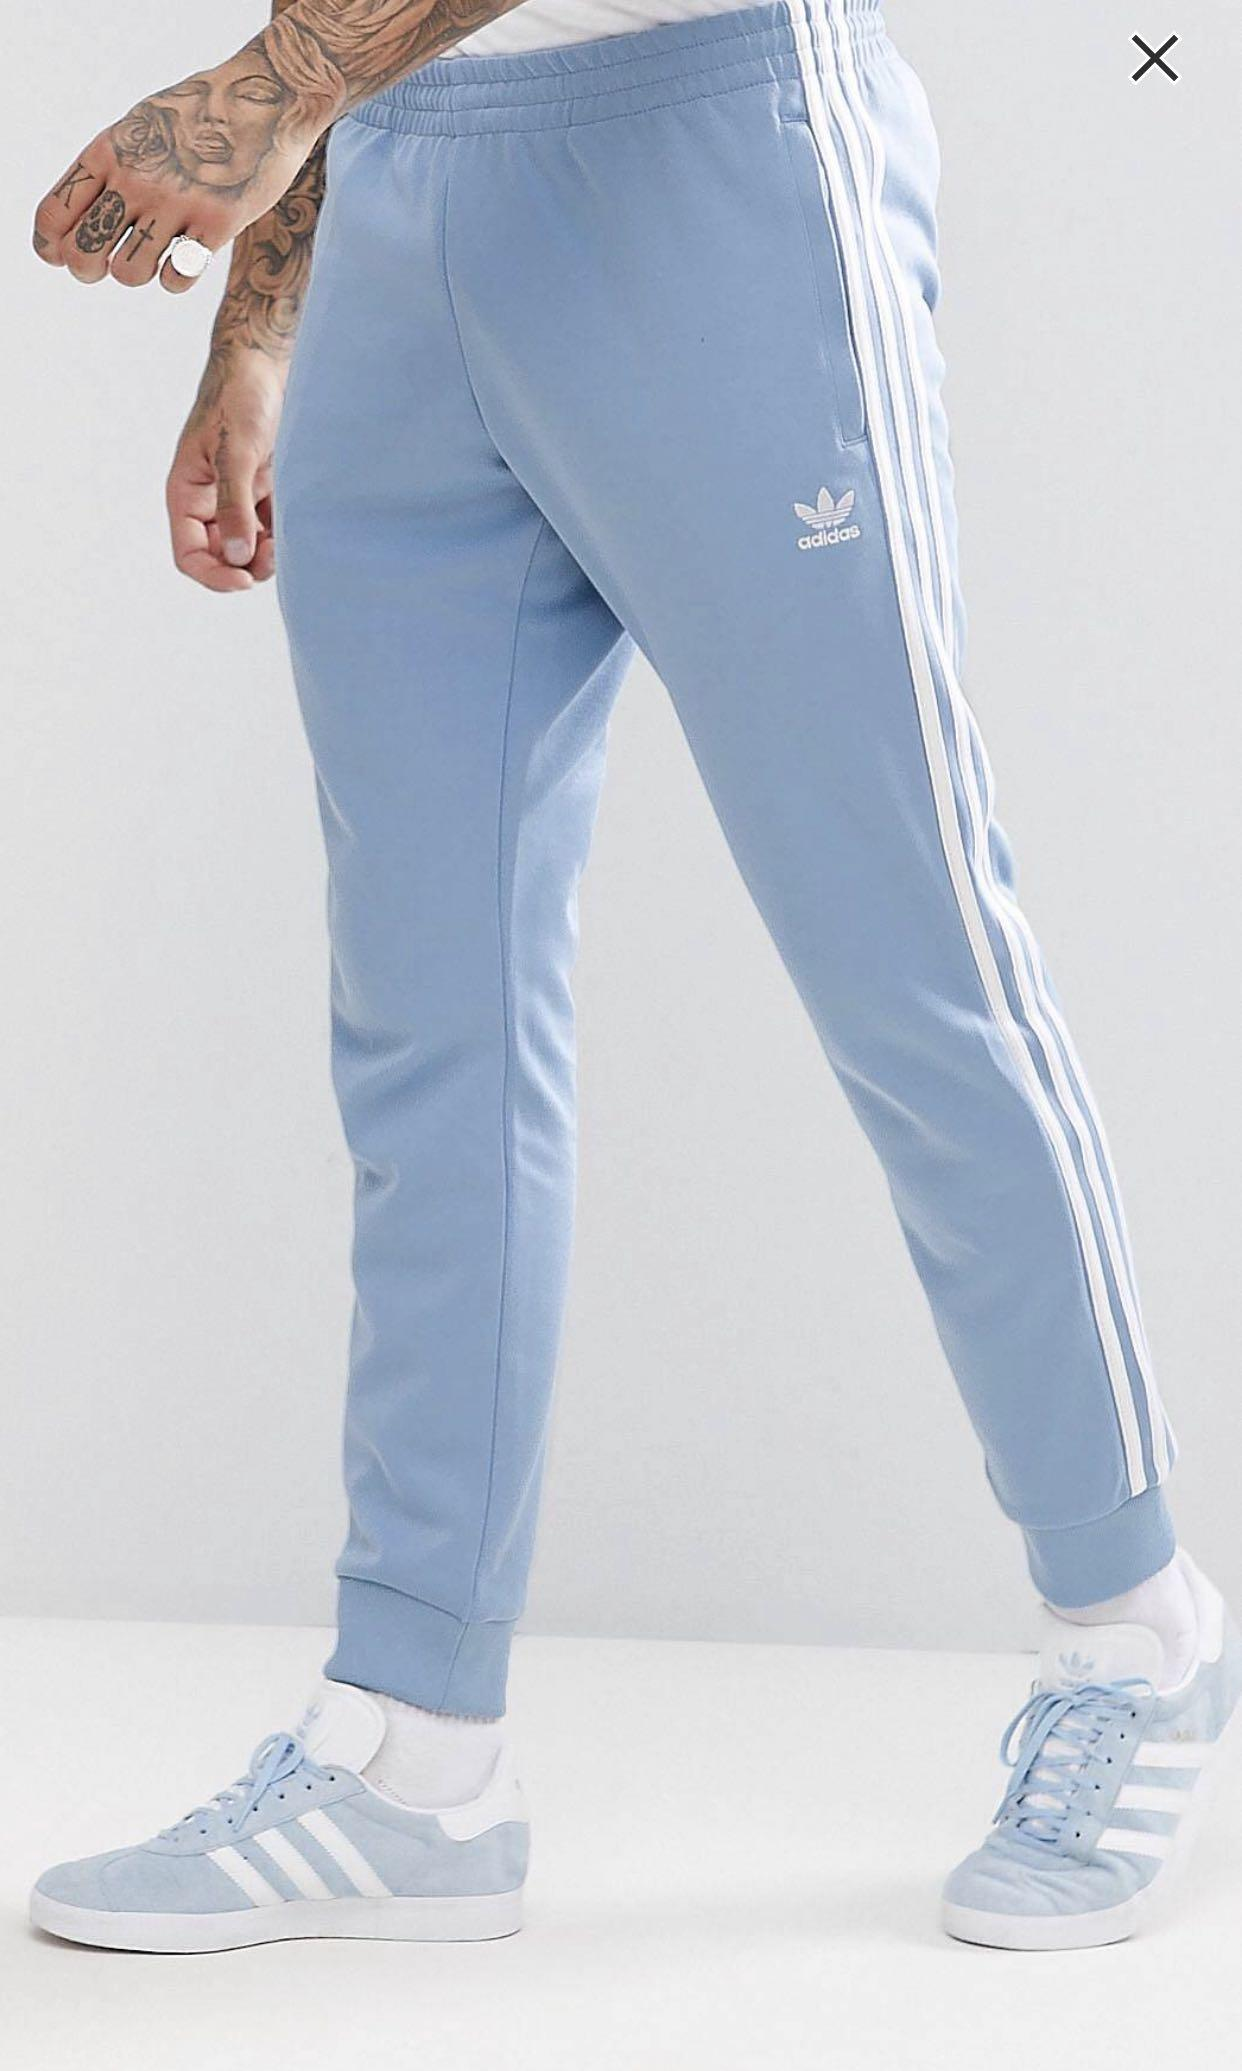 f6613e2b Adidas Track Pants, Sports, Sports Apparel on Carousell